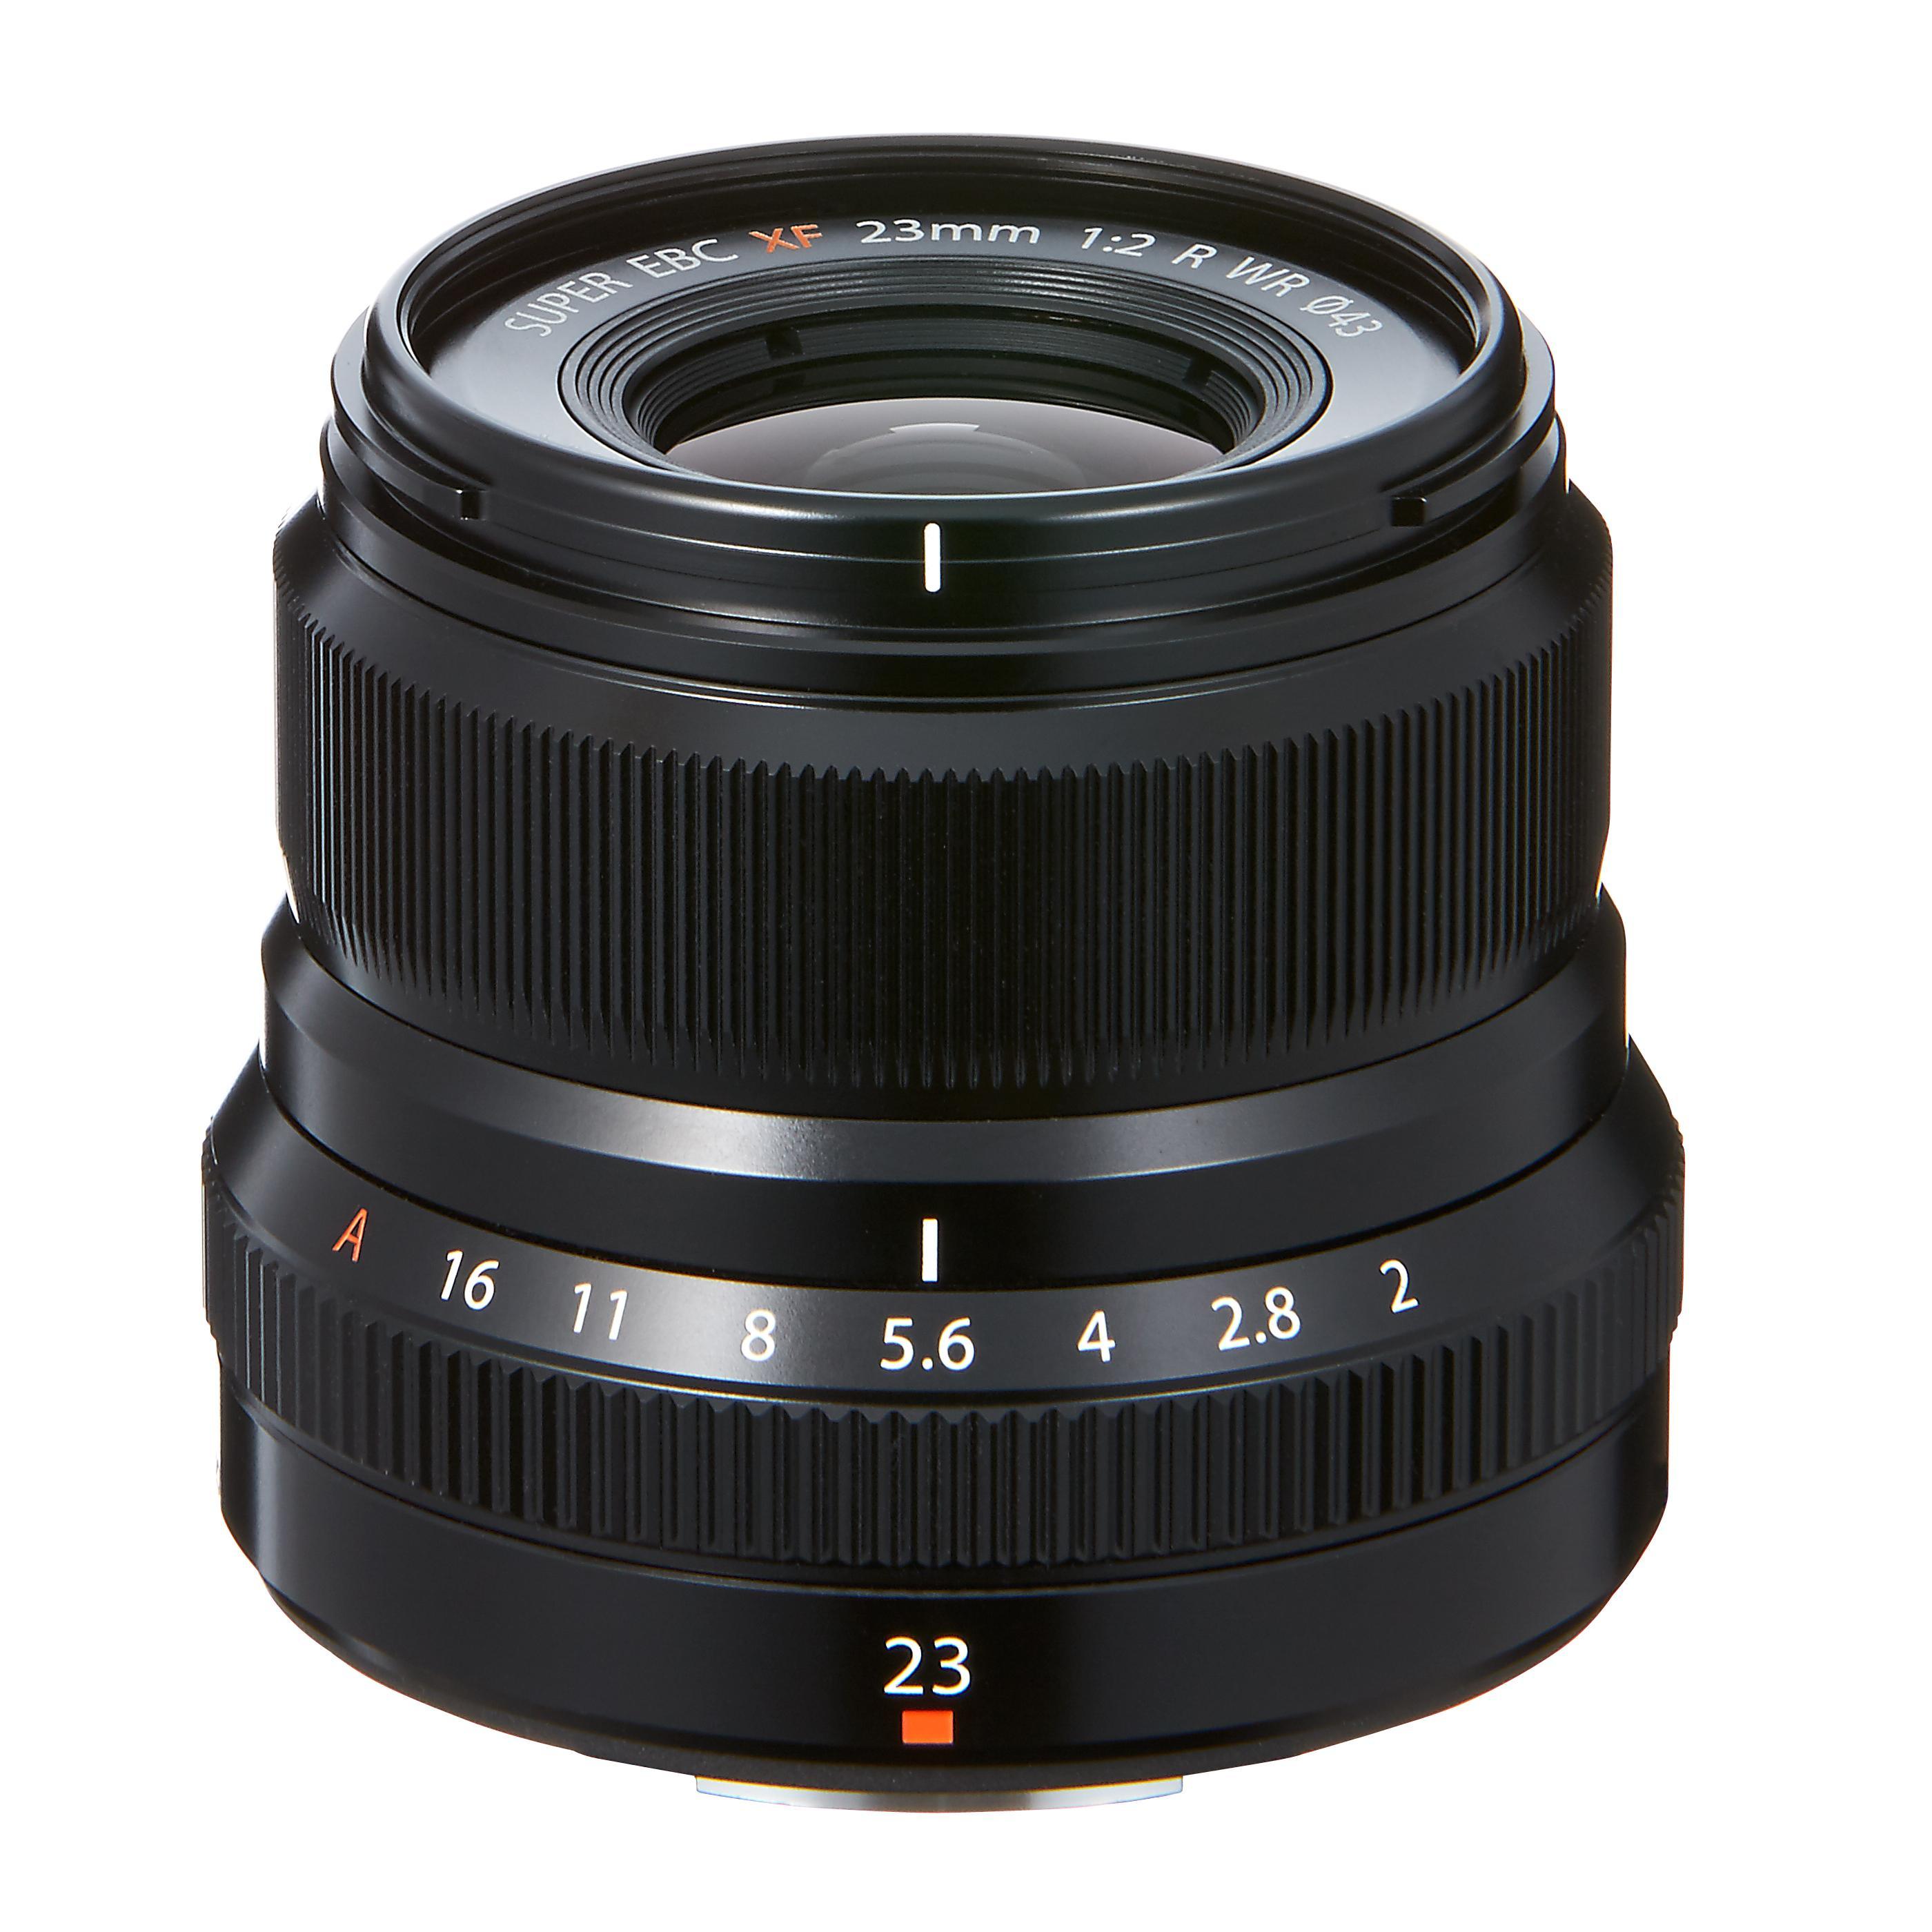 Fujifilm FUJINON XF23mm F2.0 WR Black